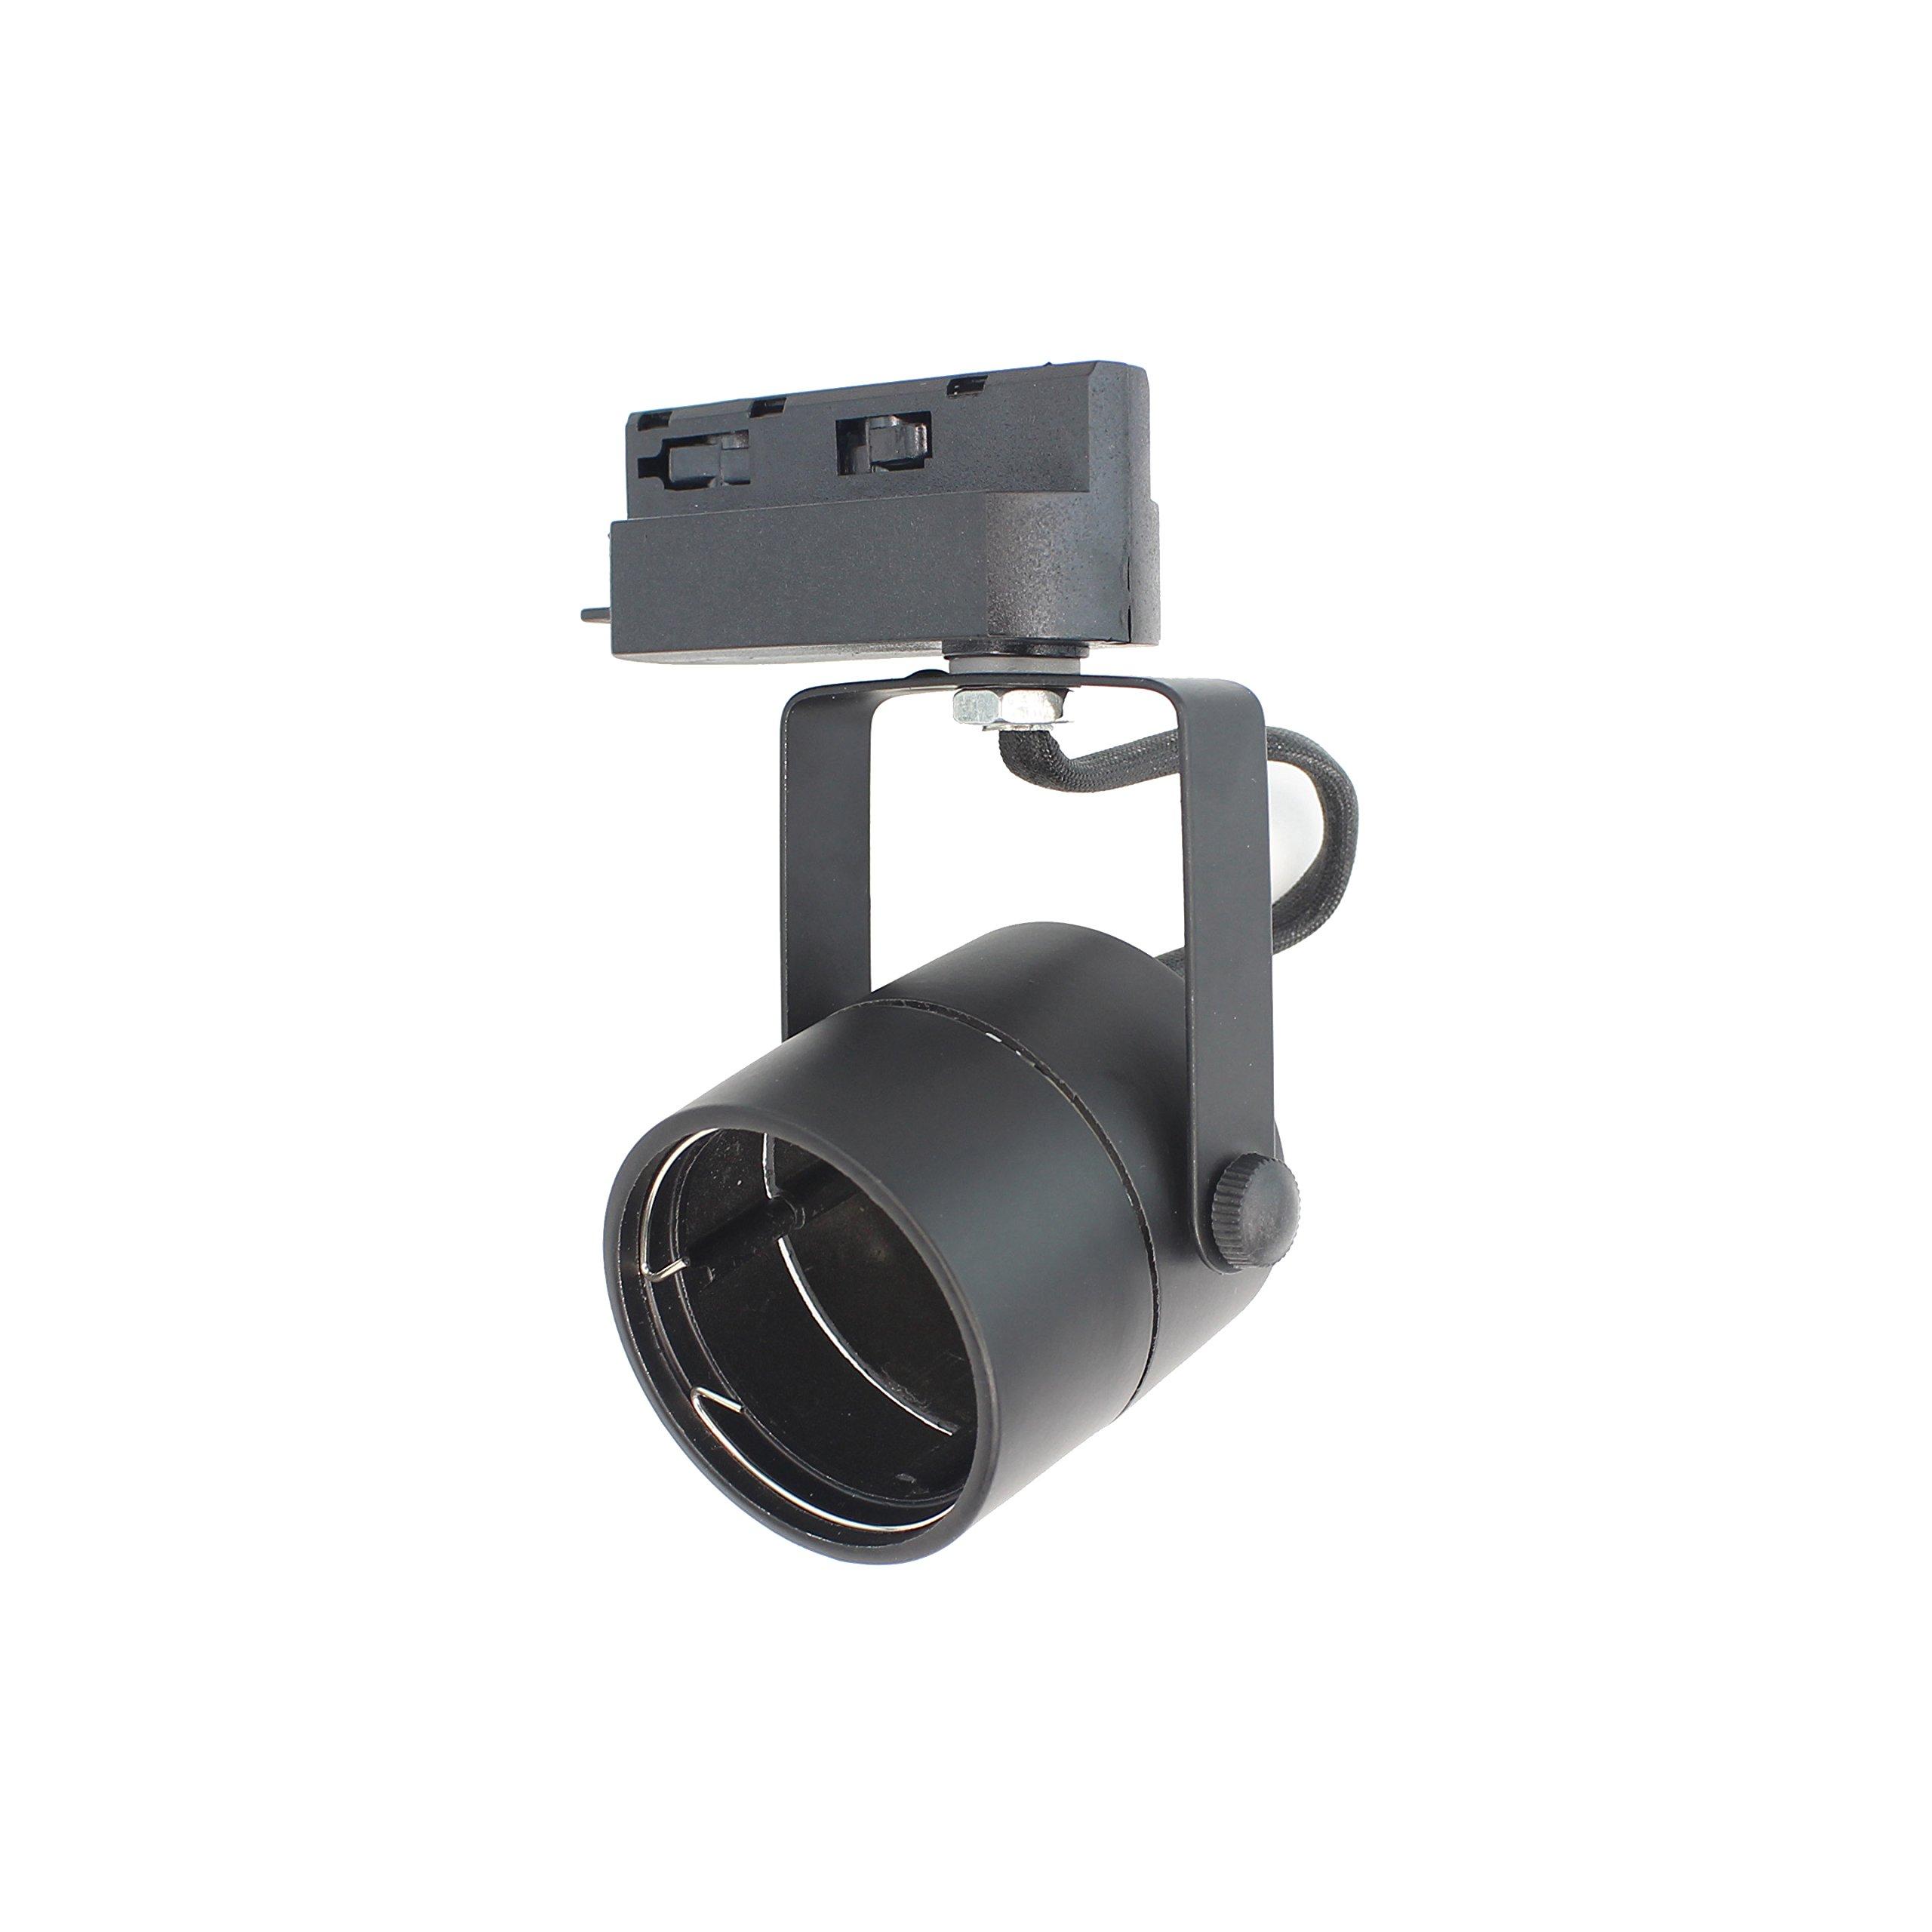 J.LUMI TRK9610 GU10 Line Voltage Track Light Head, 120V AC, Black Finish, Compatible track rail RAL3002, BULB NOT INCLUDED